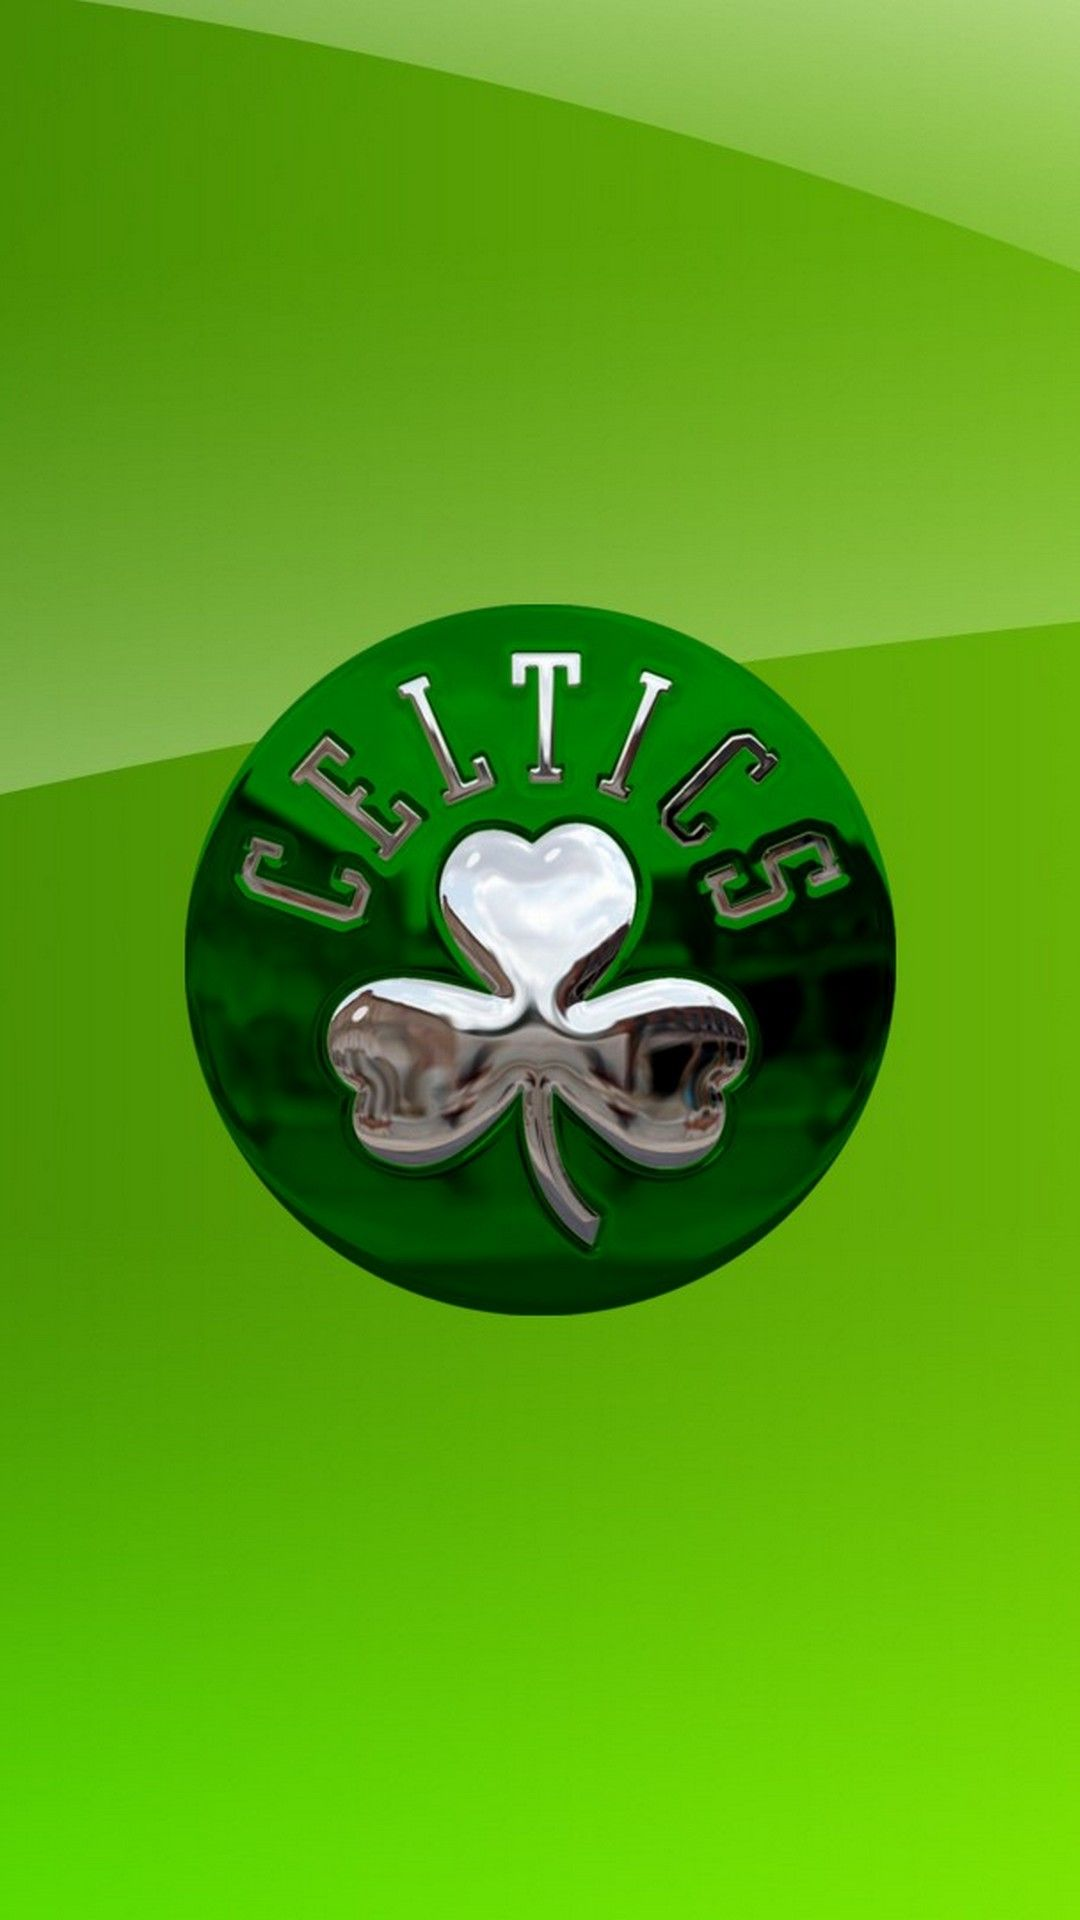 Android Wallpaper Hd Boston Celtics Best Mobile Wallpaper Hd Wallpaper Android Android Wallpaper Boston Celtics